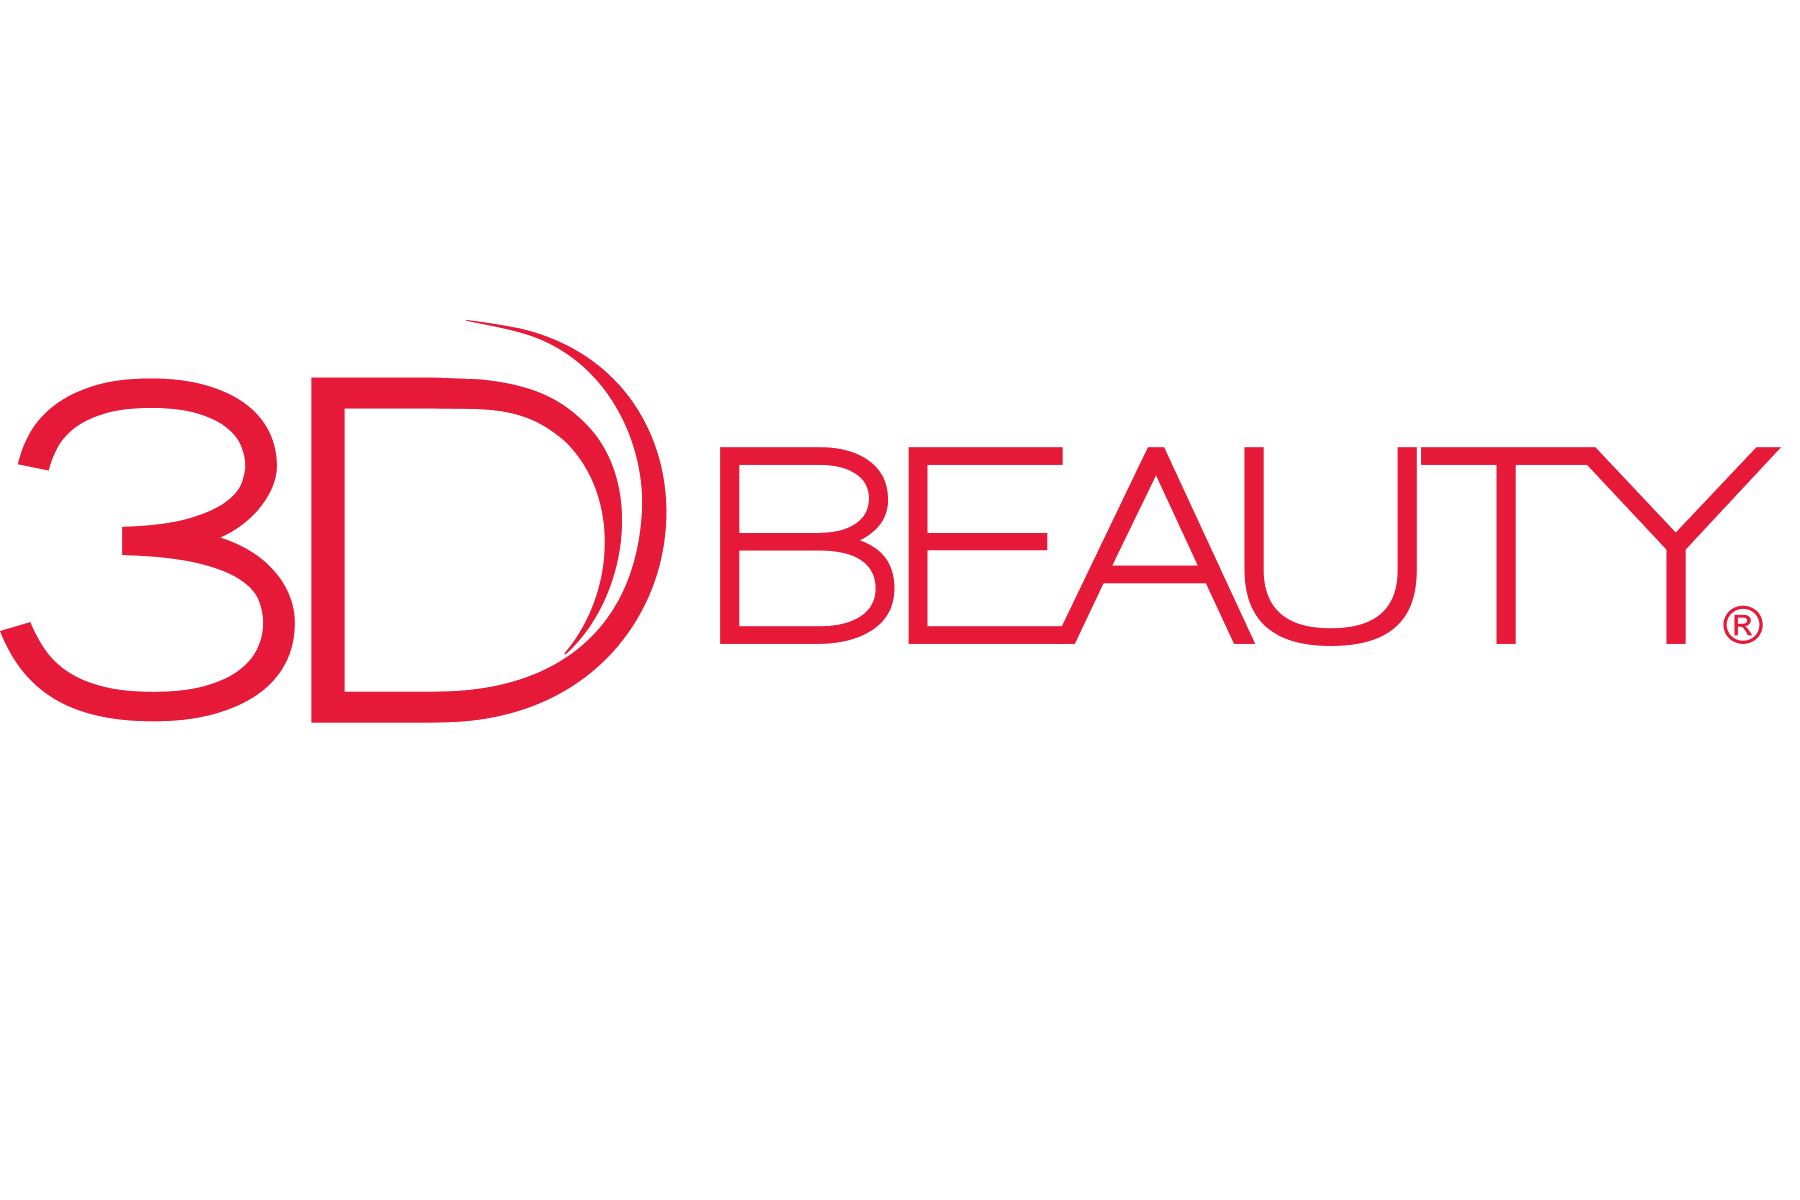 3D Beauty